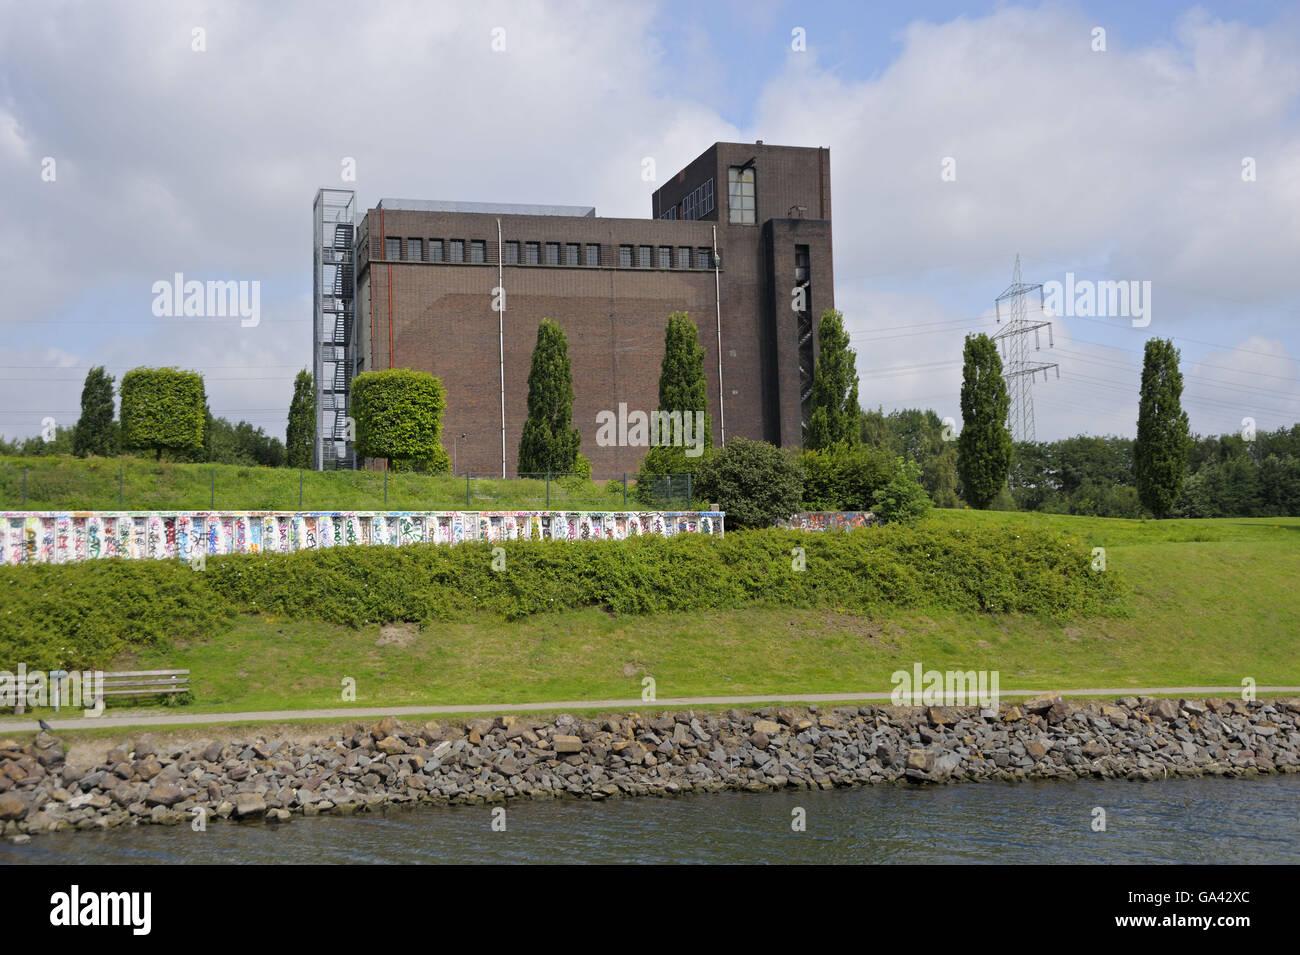 Former coal mine Nordstern, Gelsenkirchen, North Rhine-Westphalia, Germany / Industrial Heritage Trail - Stock Image